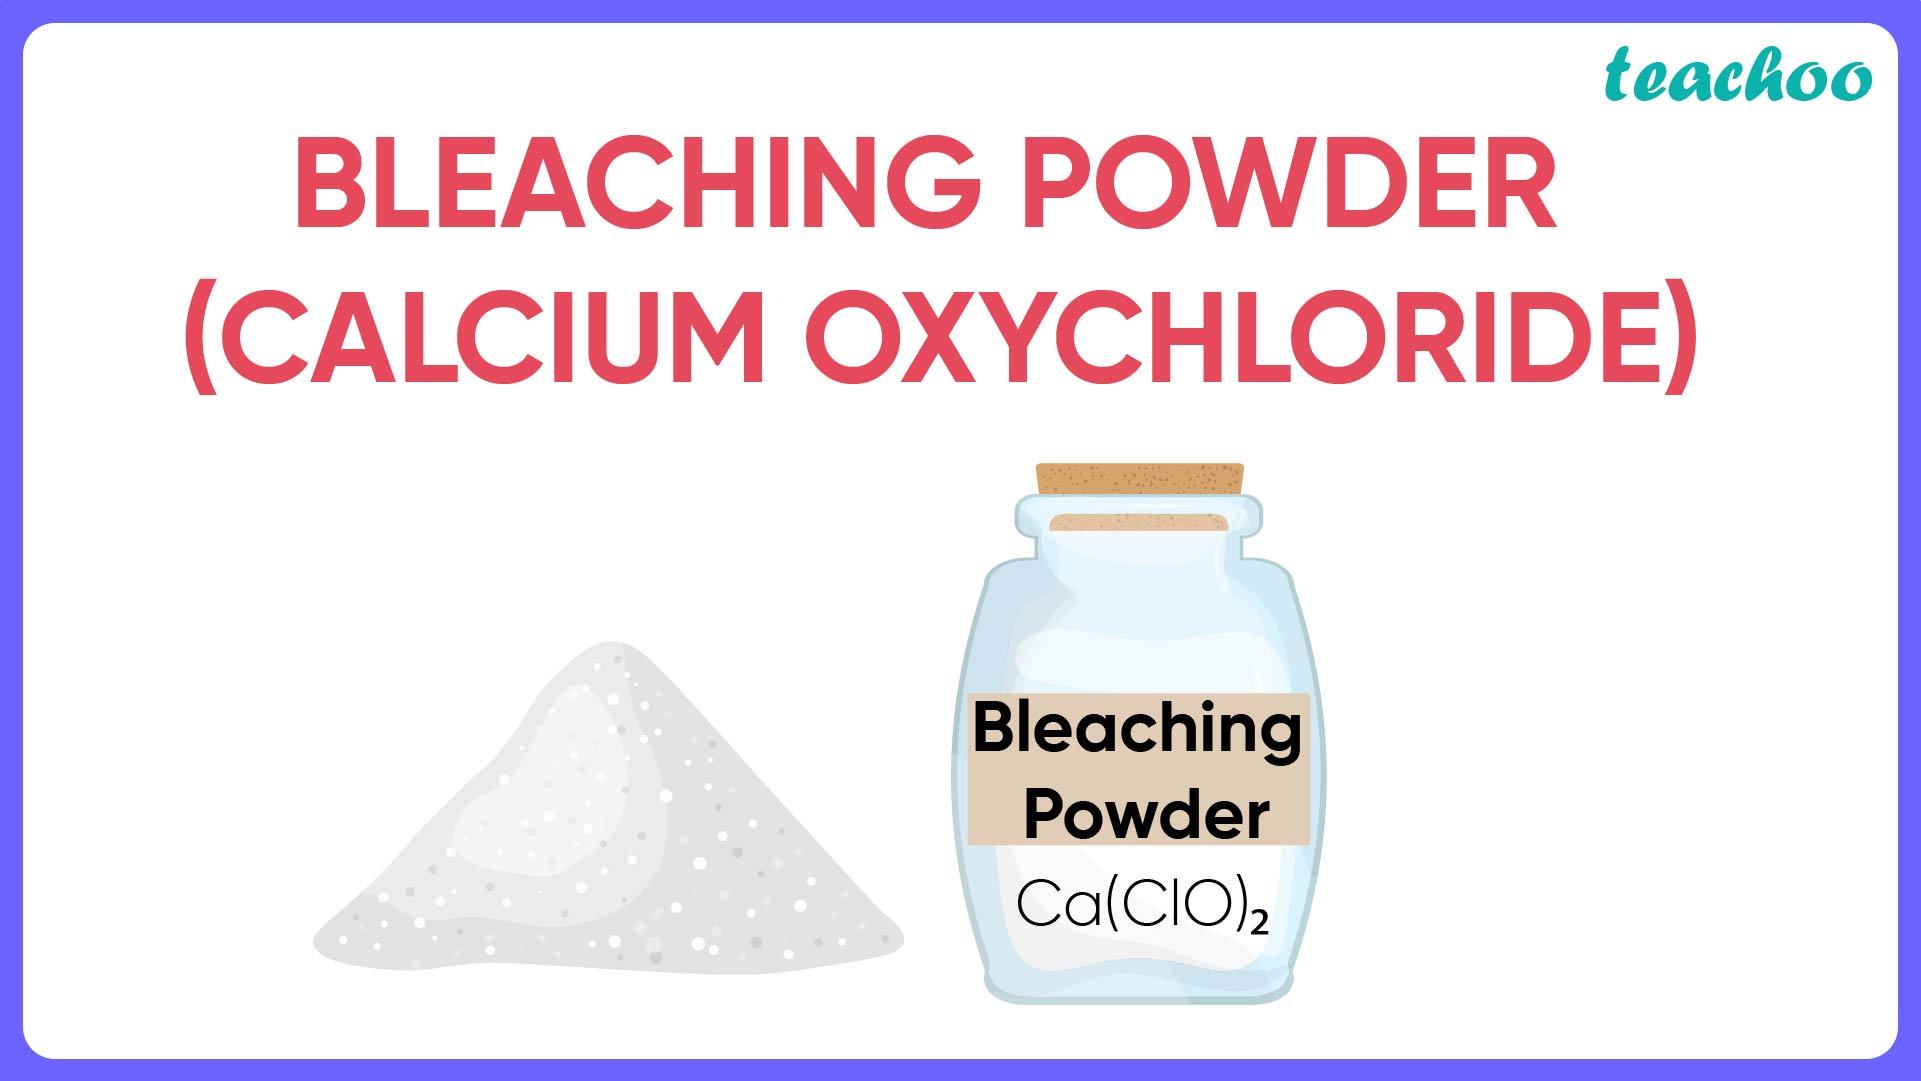 Bleaching Powder (Calcium Oxychloride)-Teachoo.jpg